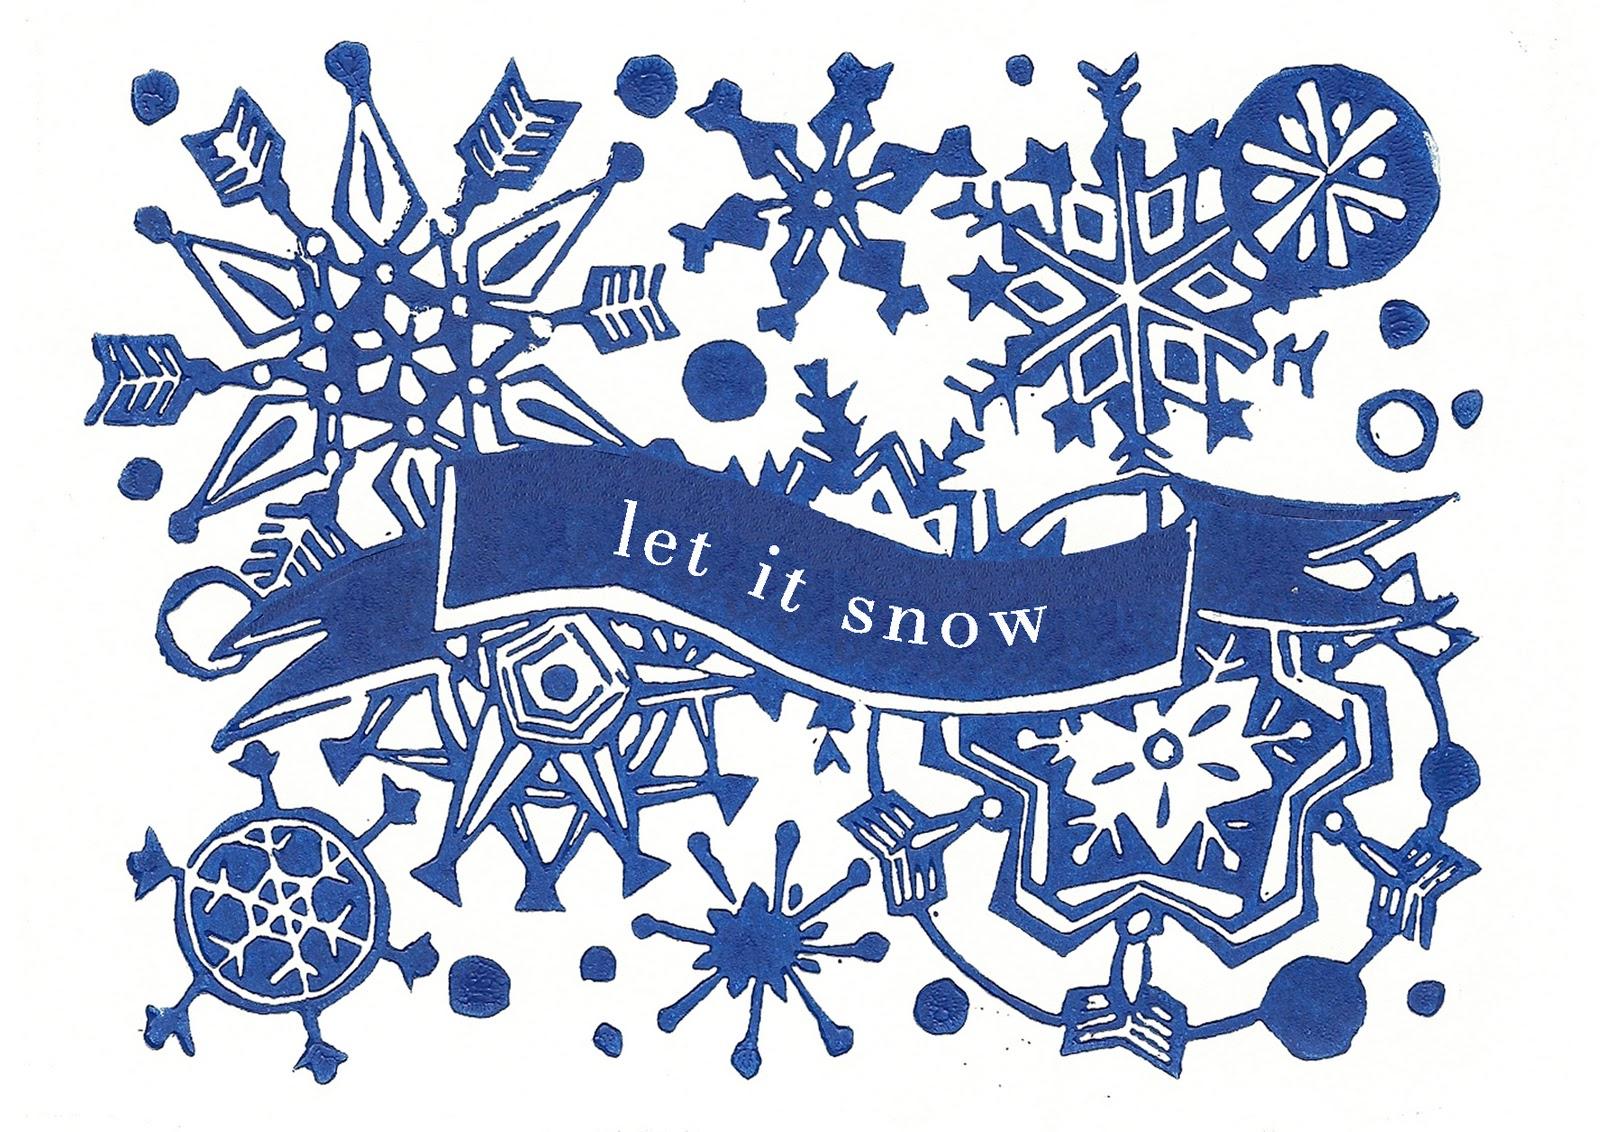 let in snow